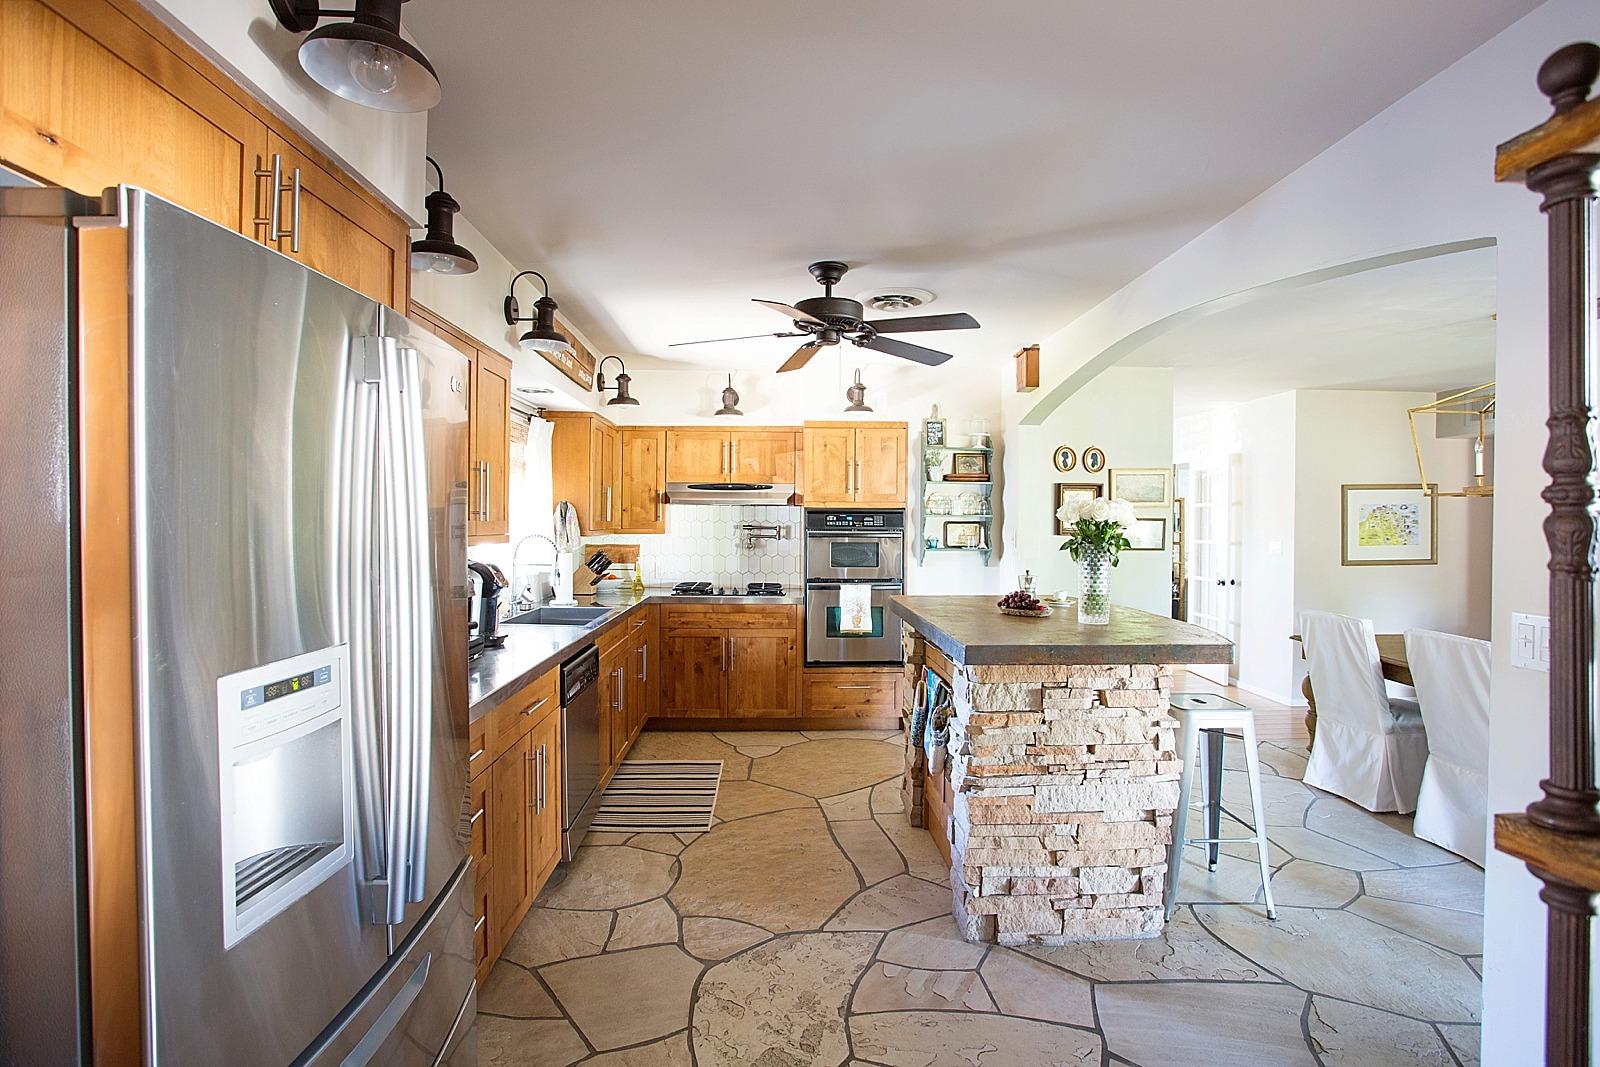 backsplash kitchen white tile vertical 6th avenue cocoon mosaic walker zanger - alternate of white subway tile kitchen